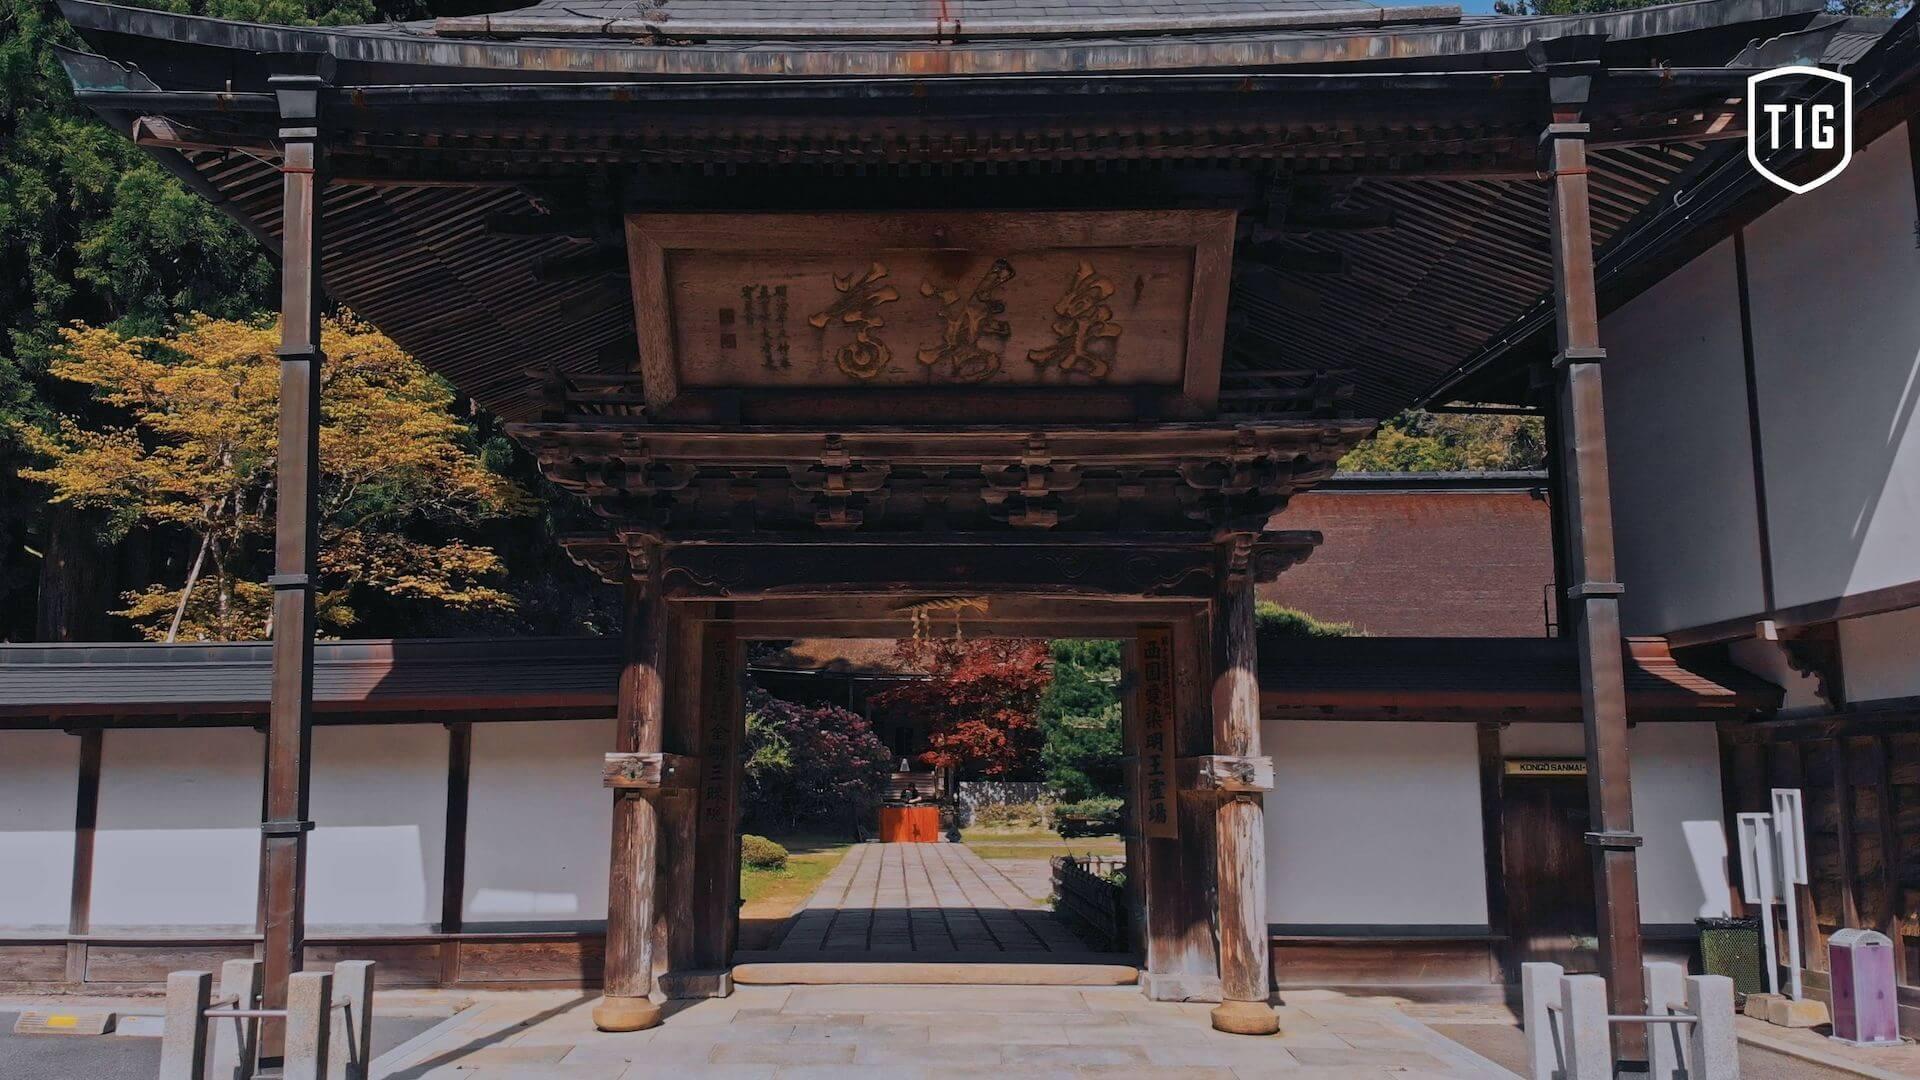 Tsuyoshi Suzukiが高野山金剛三昧院でDJを披露する「密教トランス」映像が公開 music210730-tsuyoshi-suzuki-1